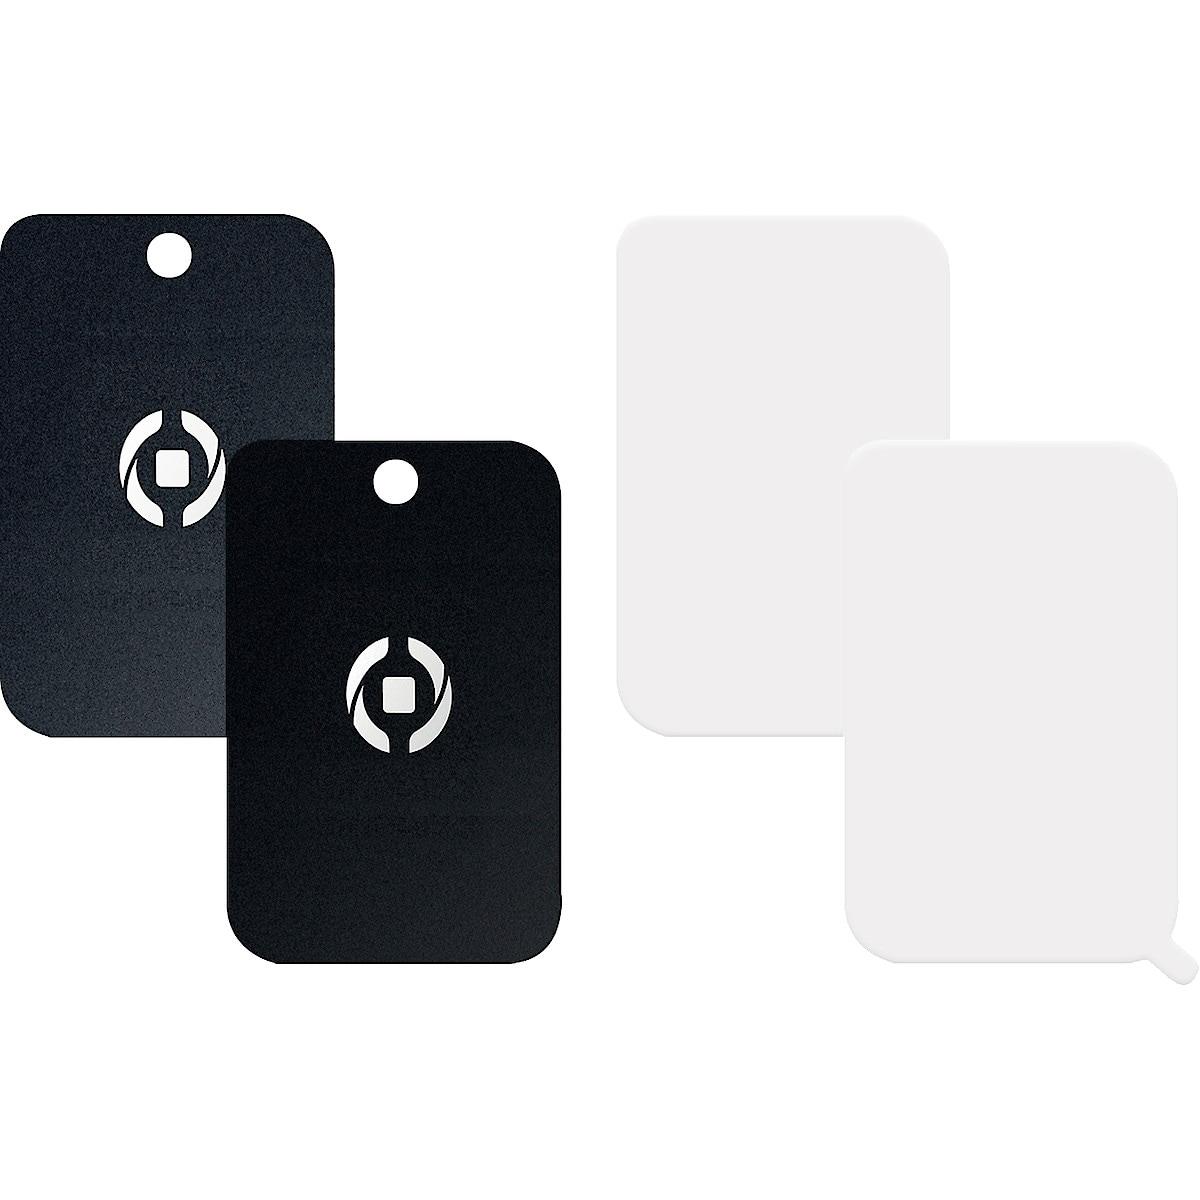 Magnetfeste for mobiltelefoner 2-pack. Celly Ghost Plate